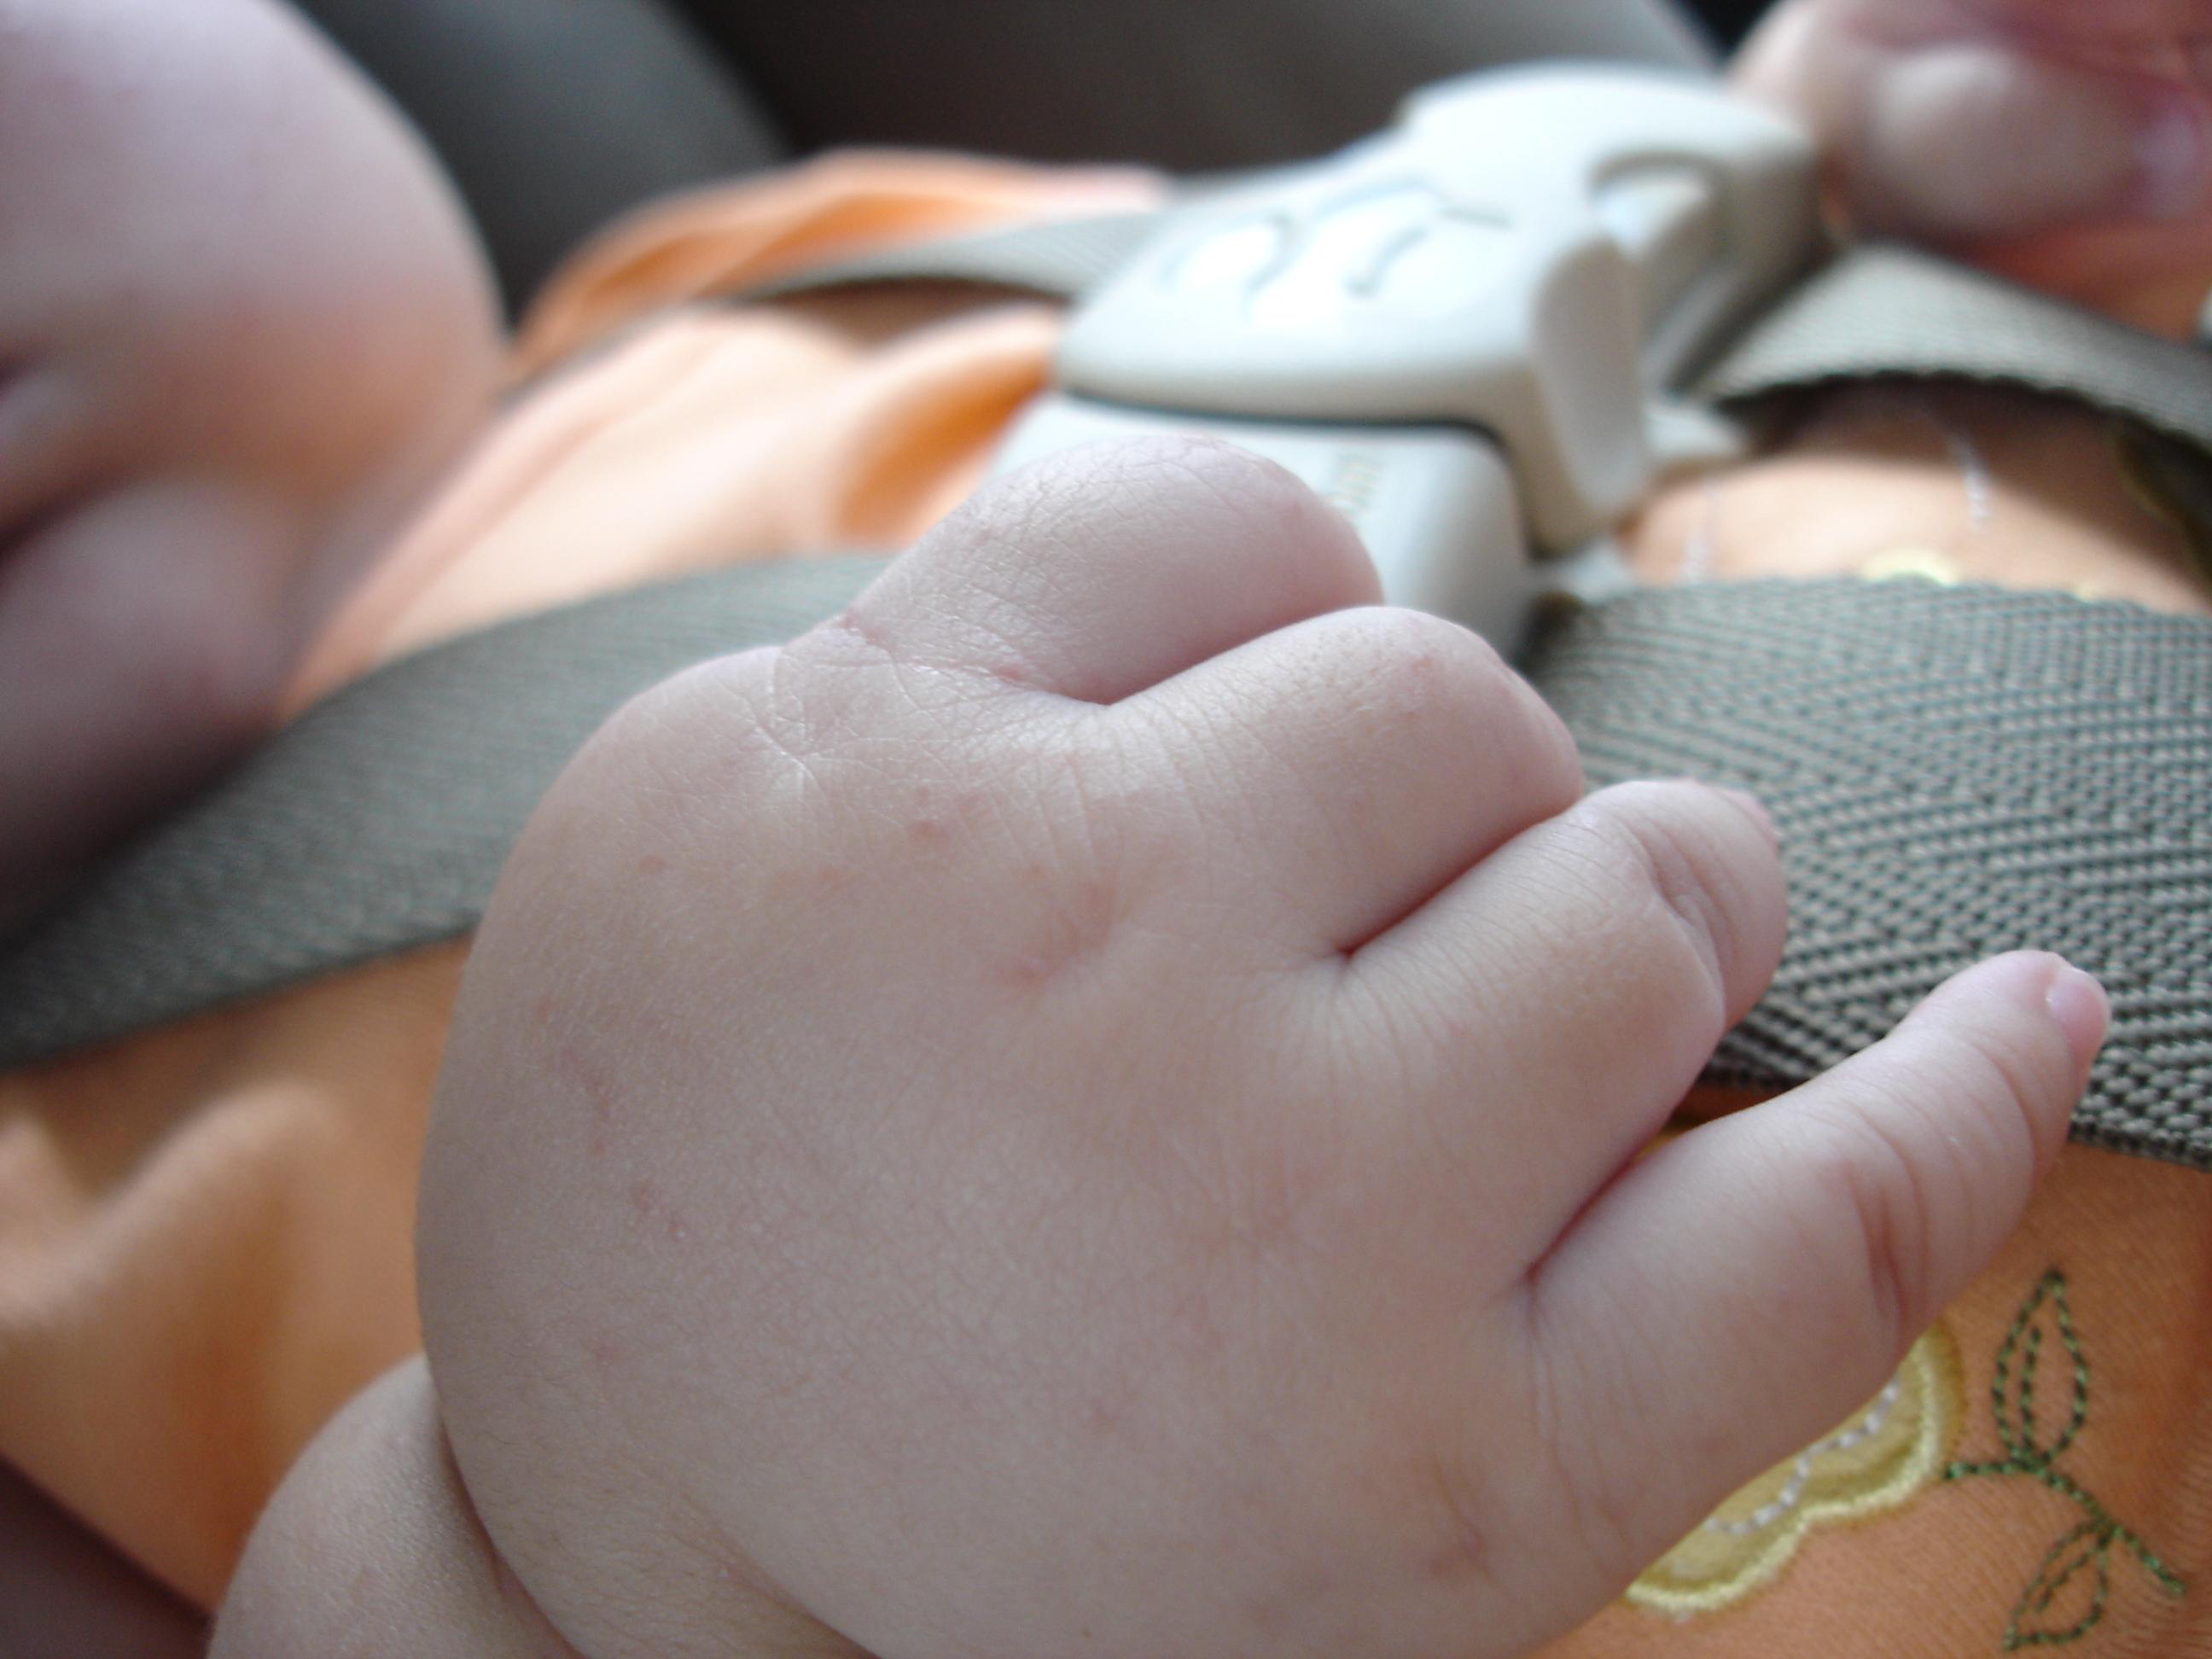 Baby_car_seat_death